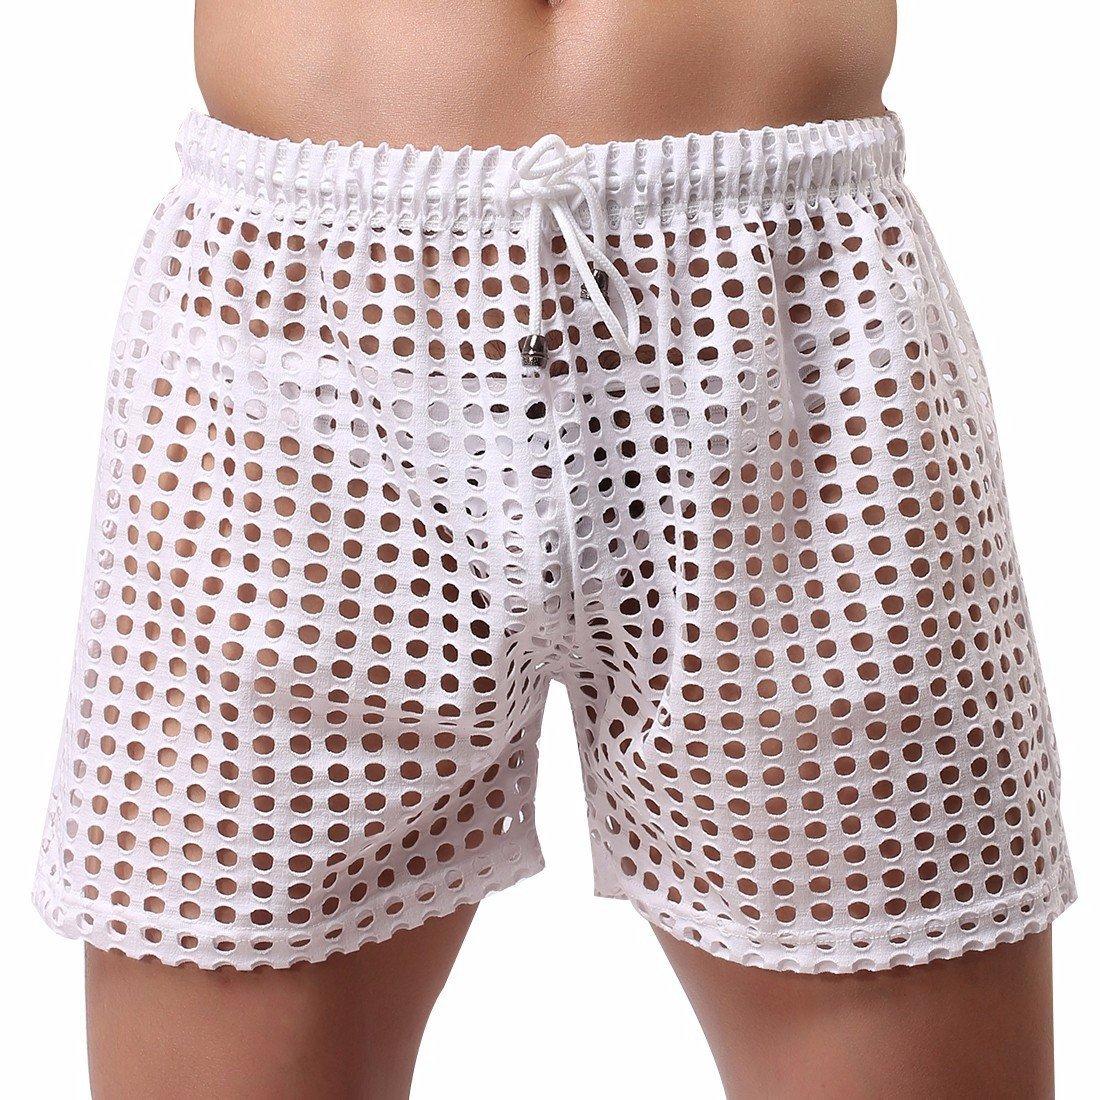 Best Rated in Men's Bikini Underwear & Helpful Customer